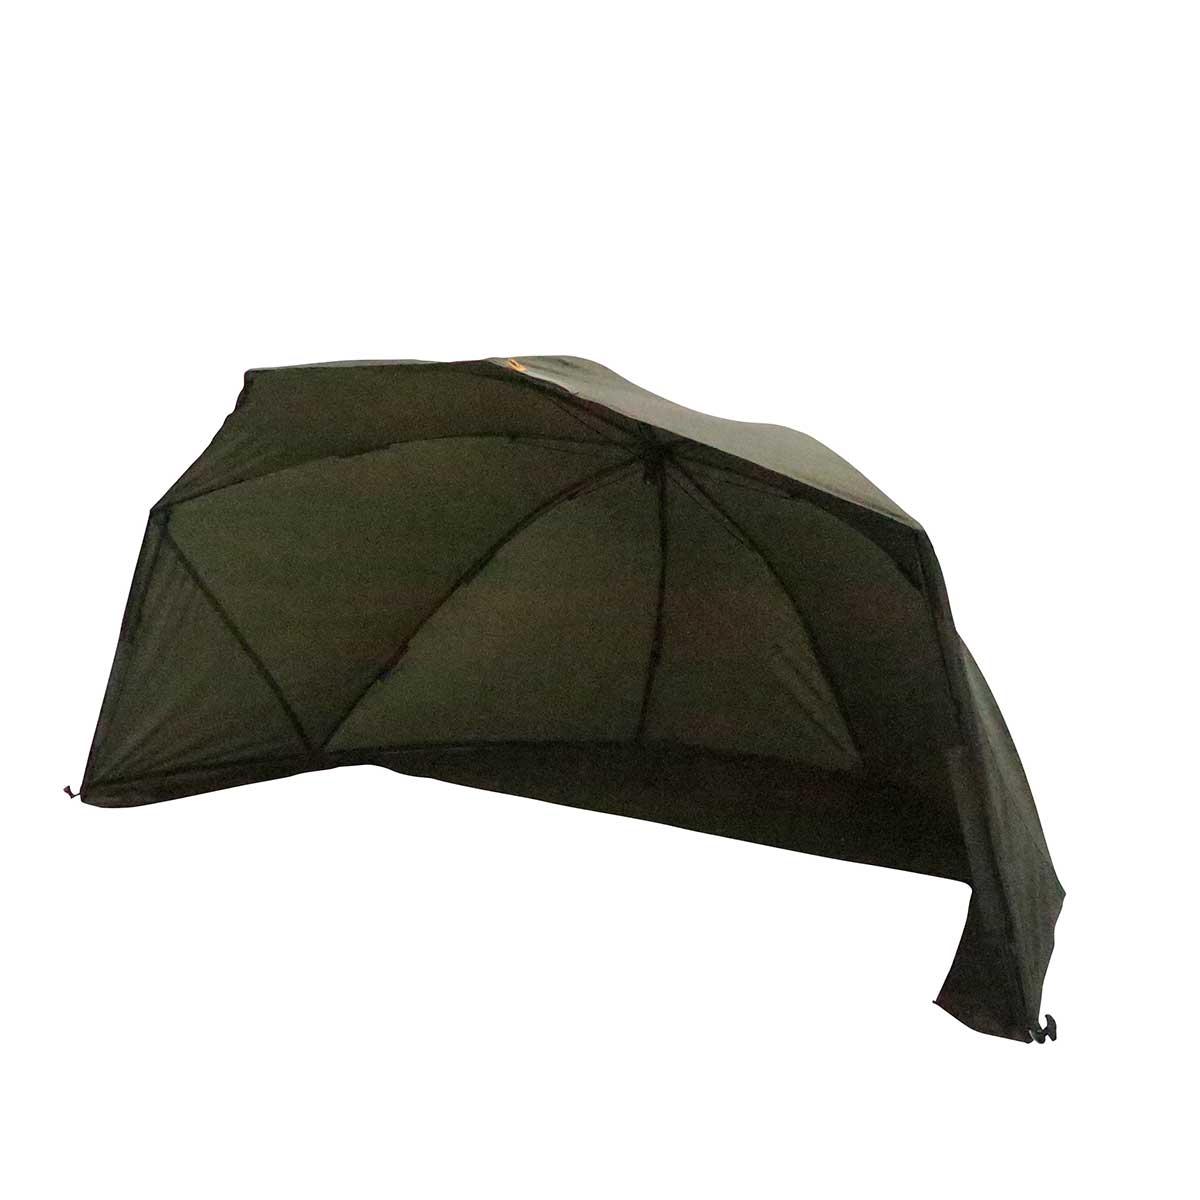 DAM Parasol Namiot MAD D Fenfder Oval Brolly 52318